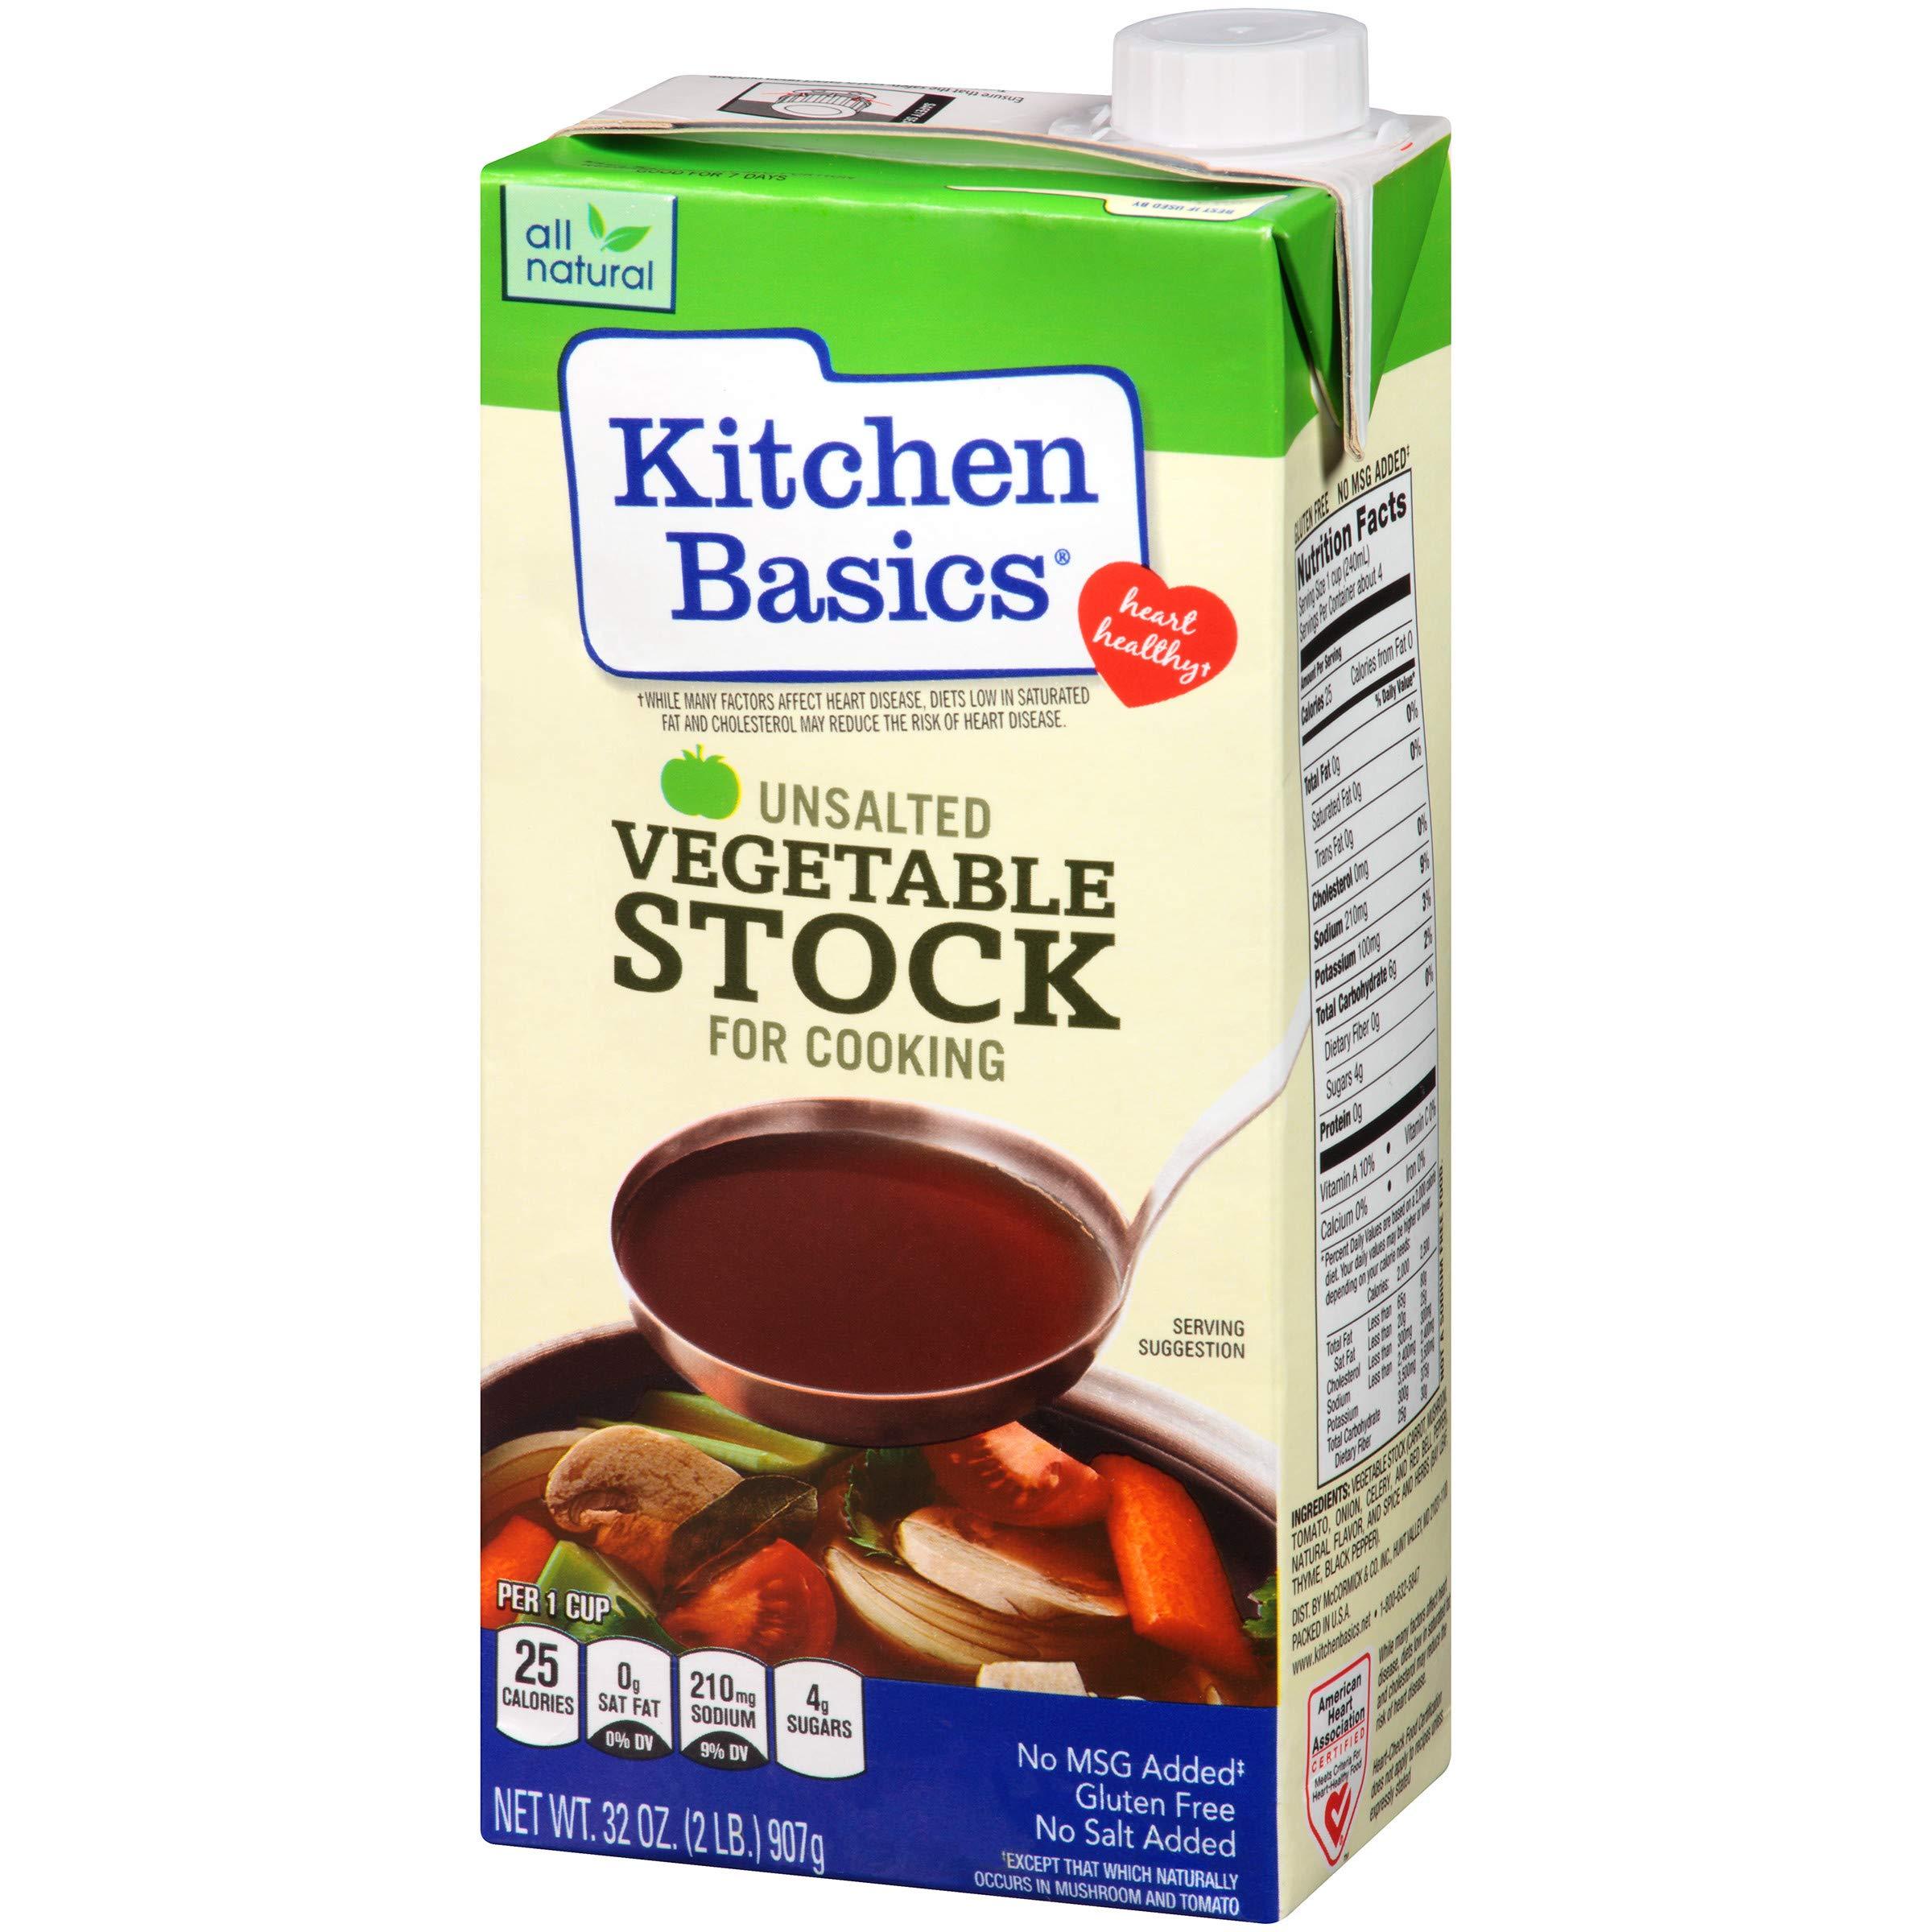 kitchen basics unsalted vegetable stock 32 fl oz - Kitchen Basics